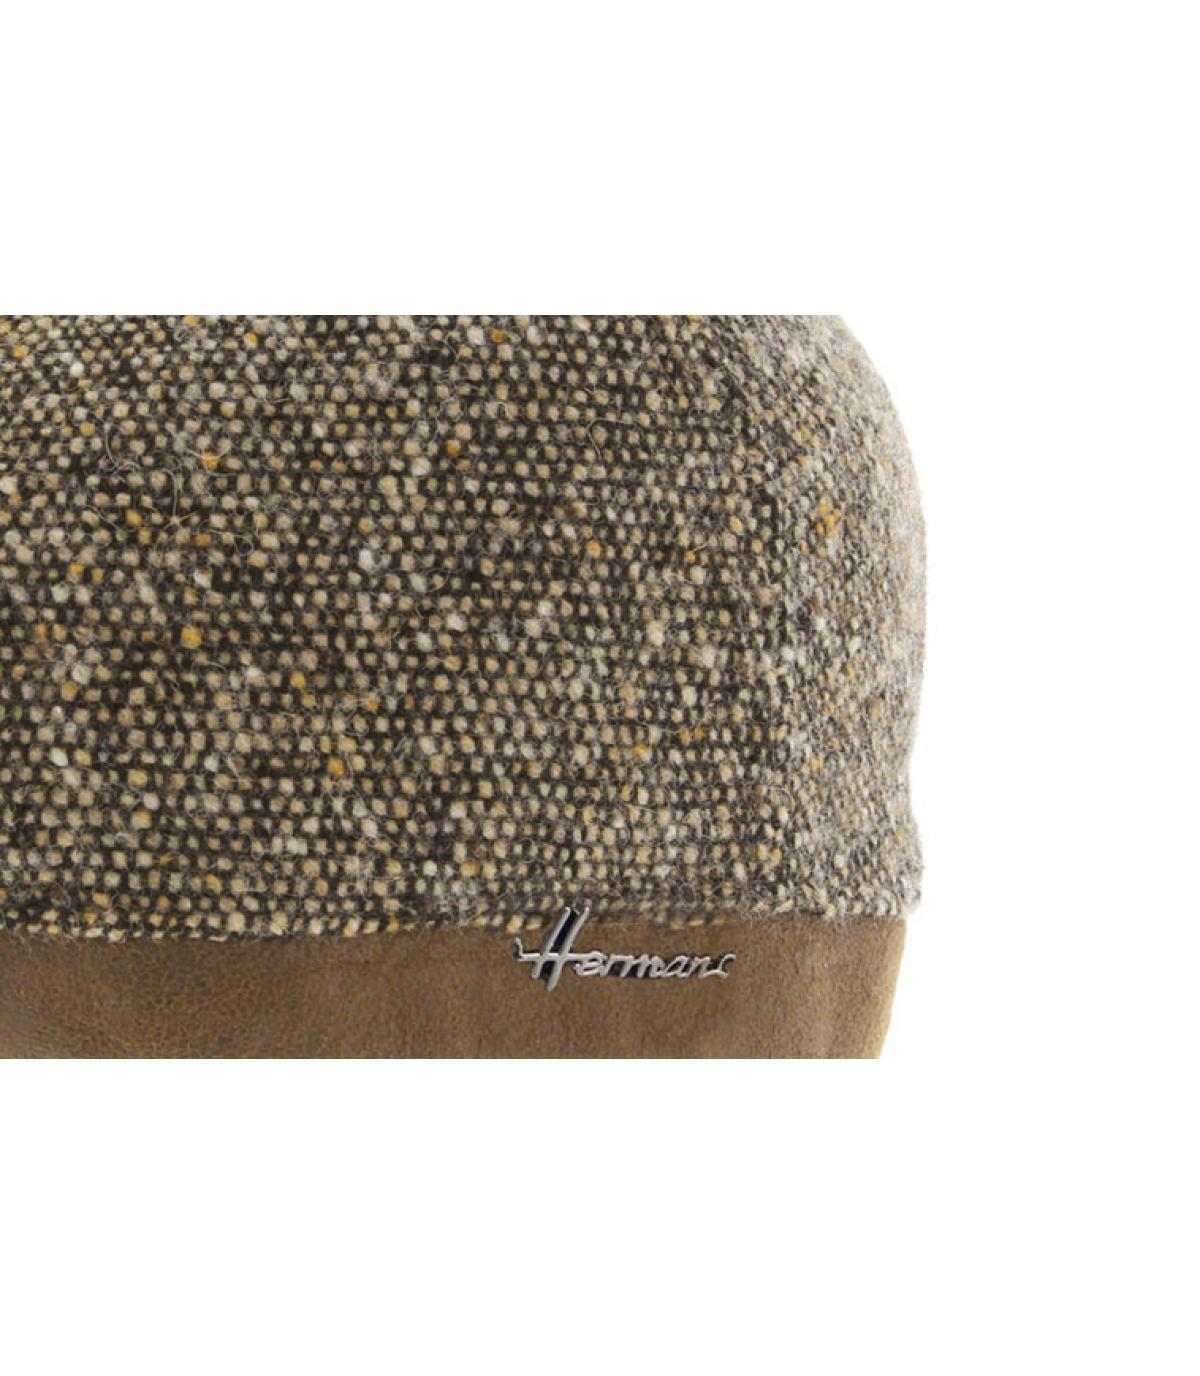 Dettagli Grasberg Wool taupe - image 3